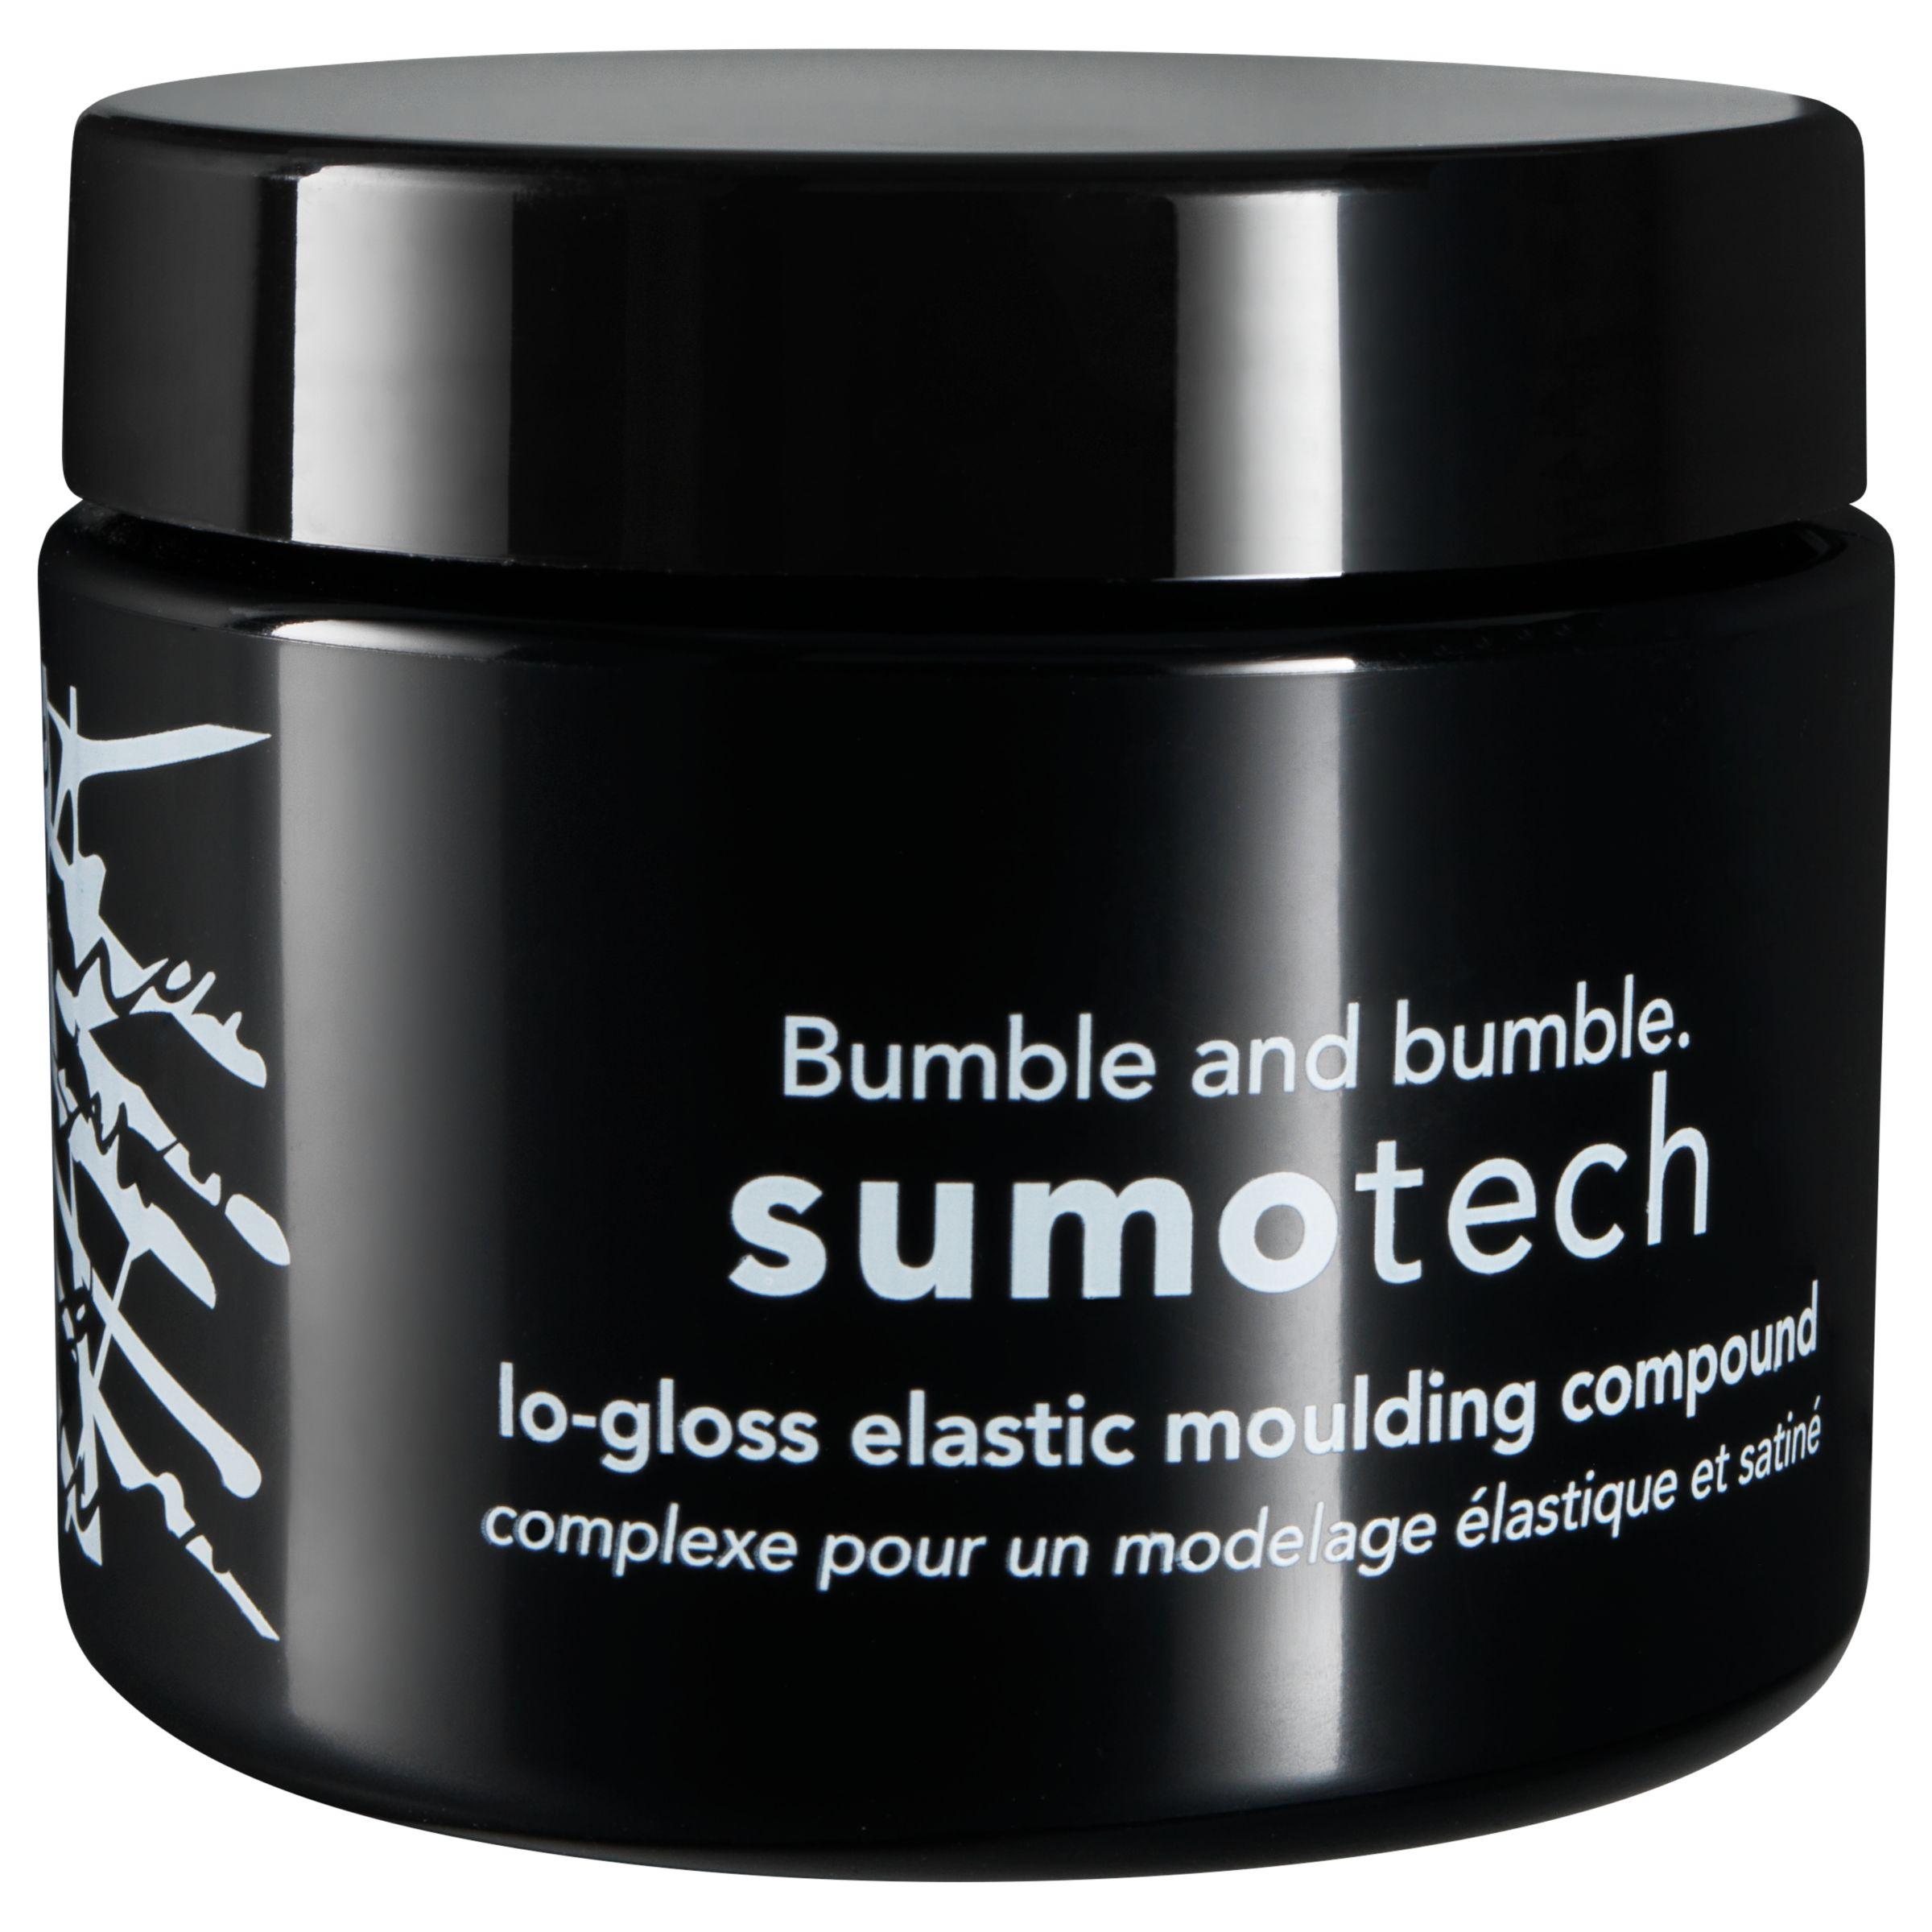 Bumble and bumble Bumble and bumble Sumotech, 50ml